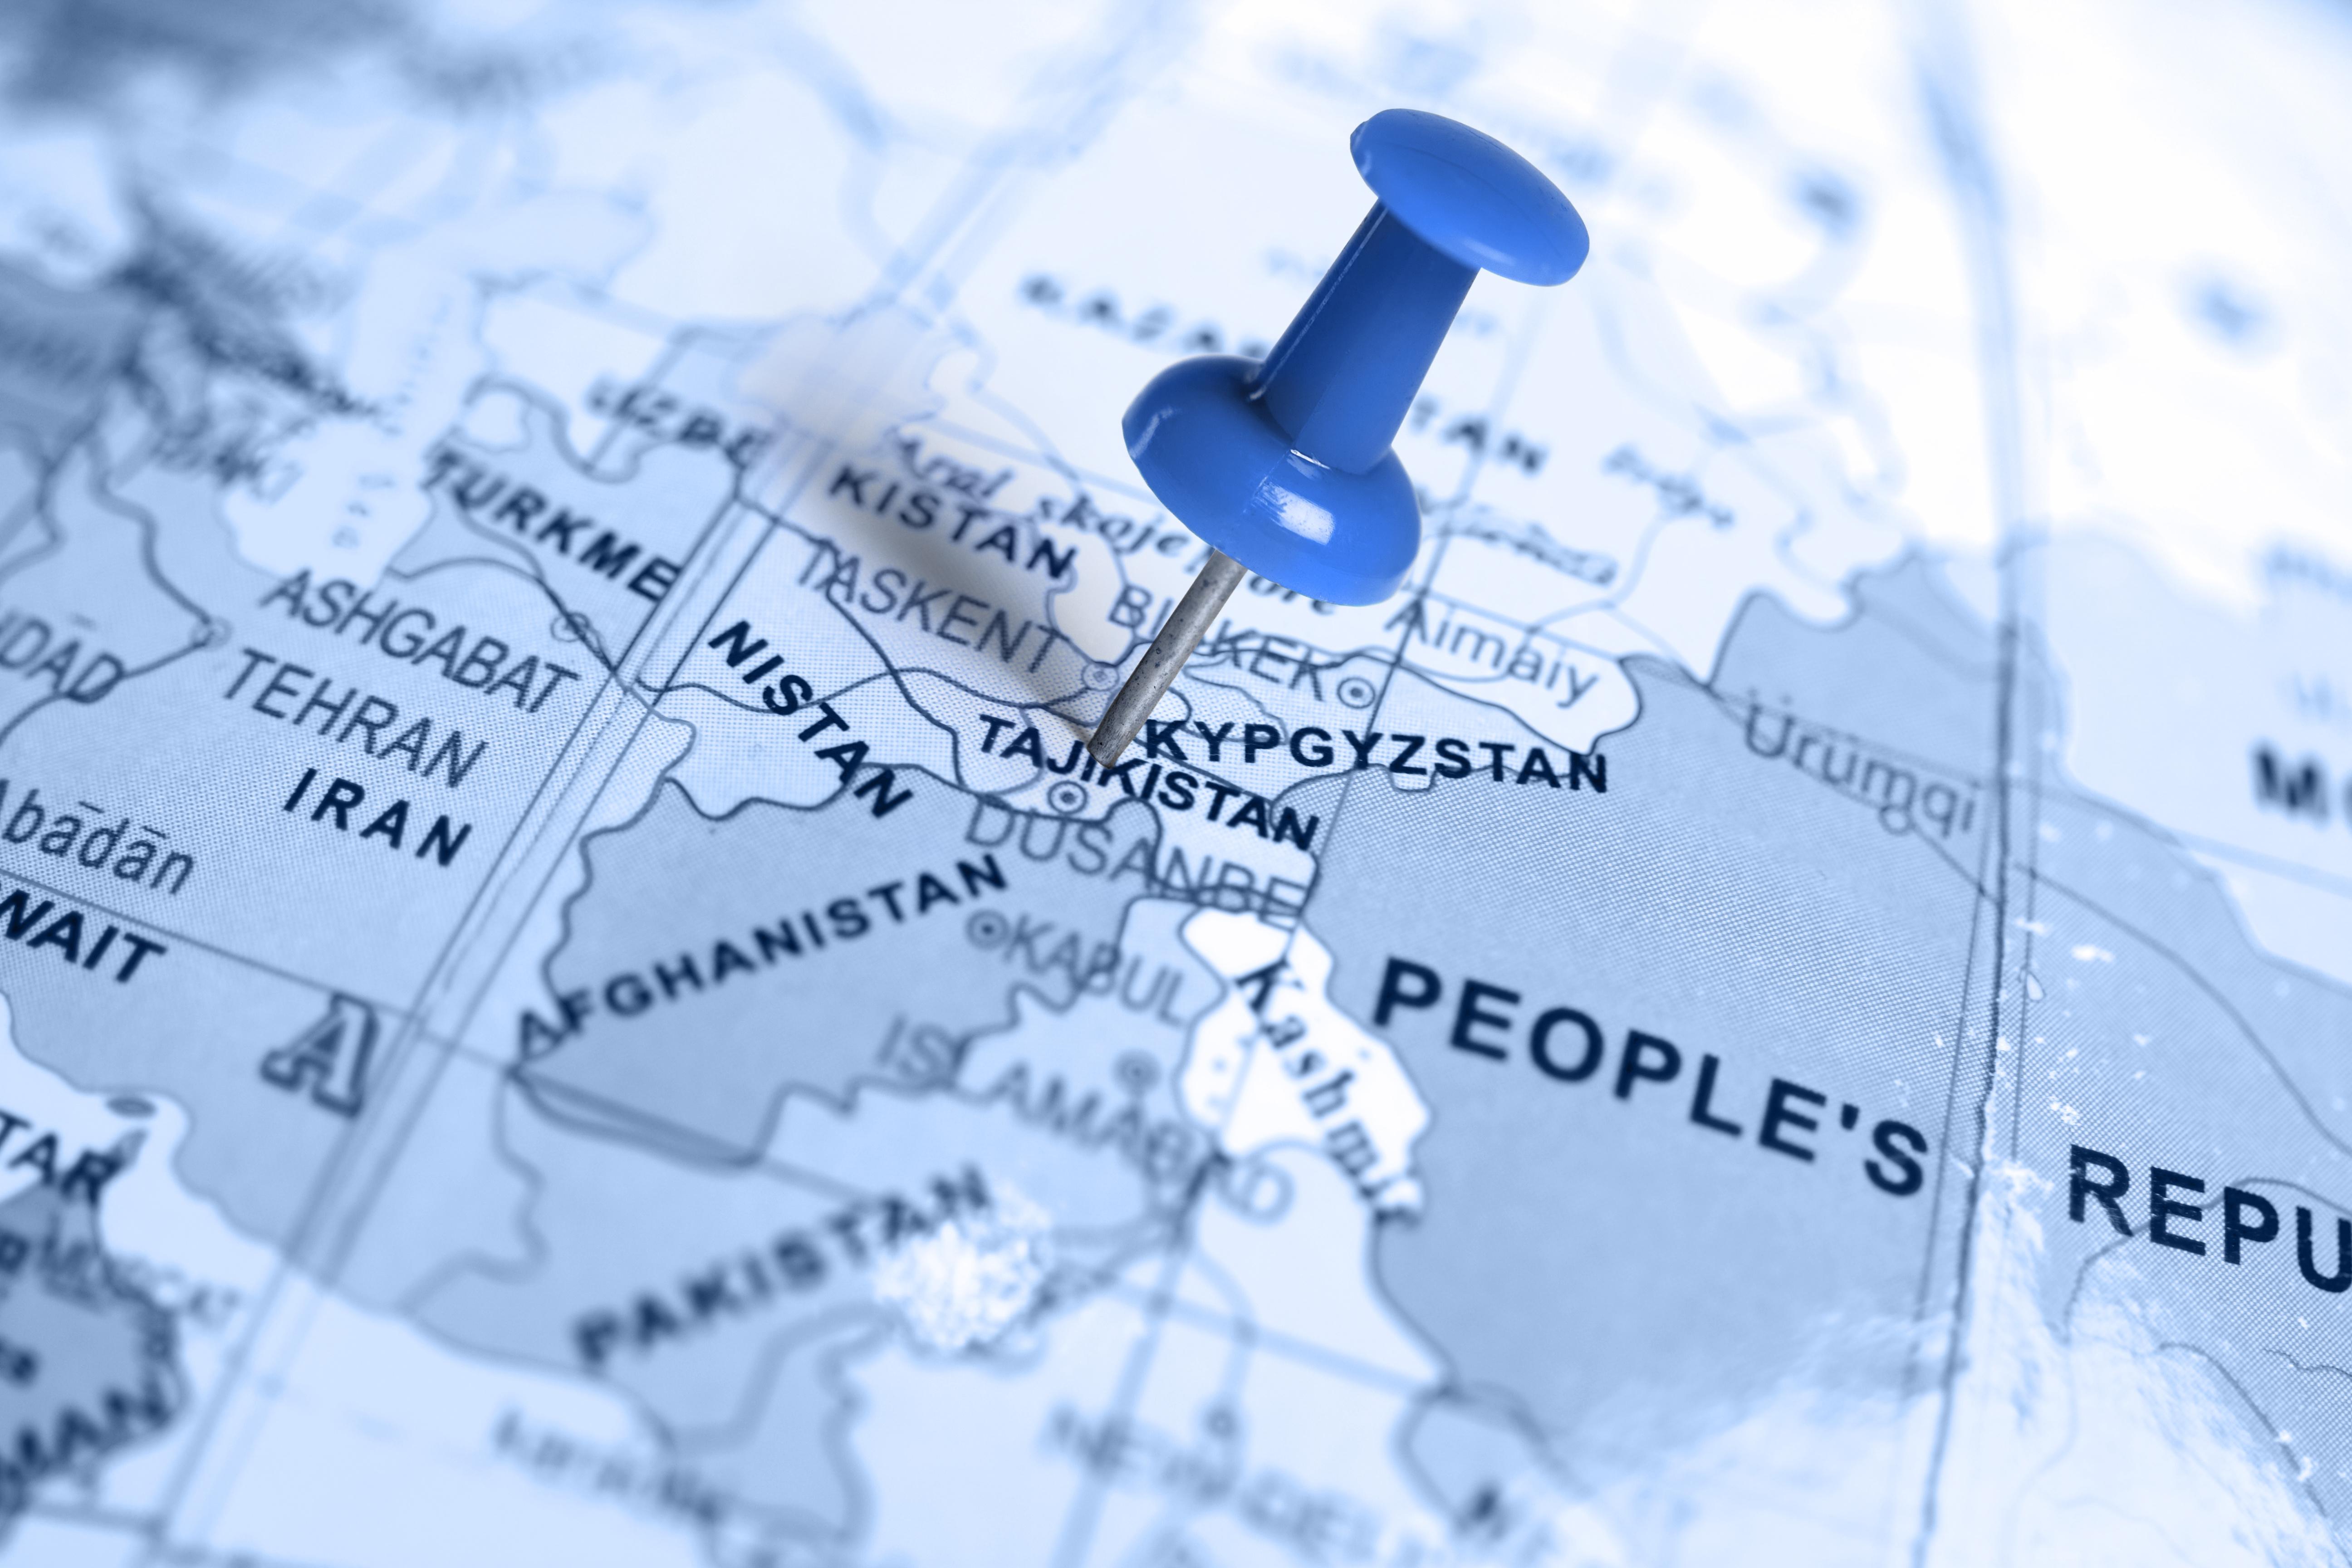 Location Tajikistan. Blue pin on the map.